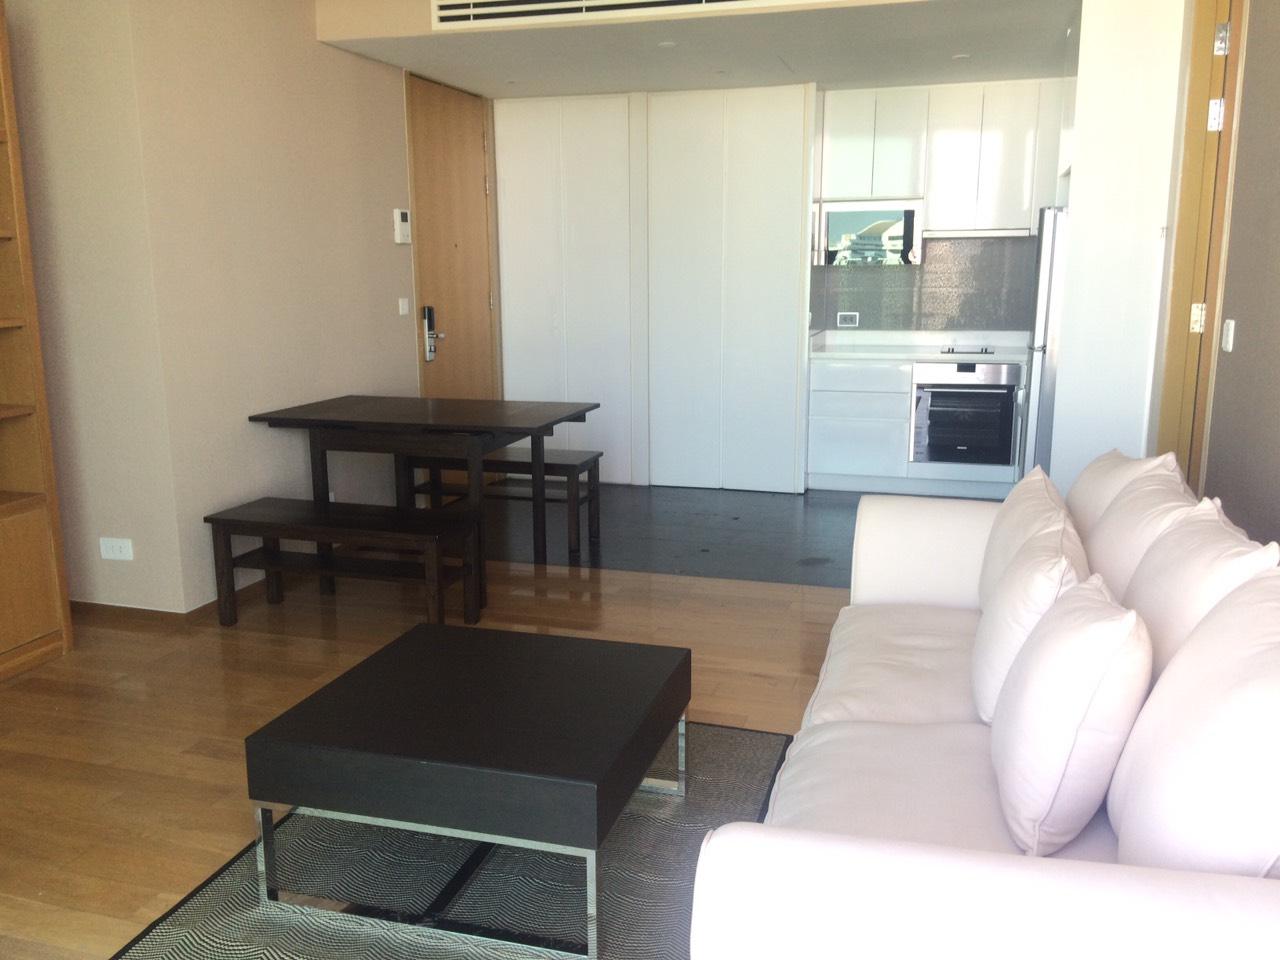 RE/MAX Properties Agency's SALE 1 Bedroom 61 Sq.m at Aequa 13